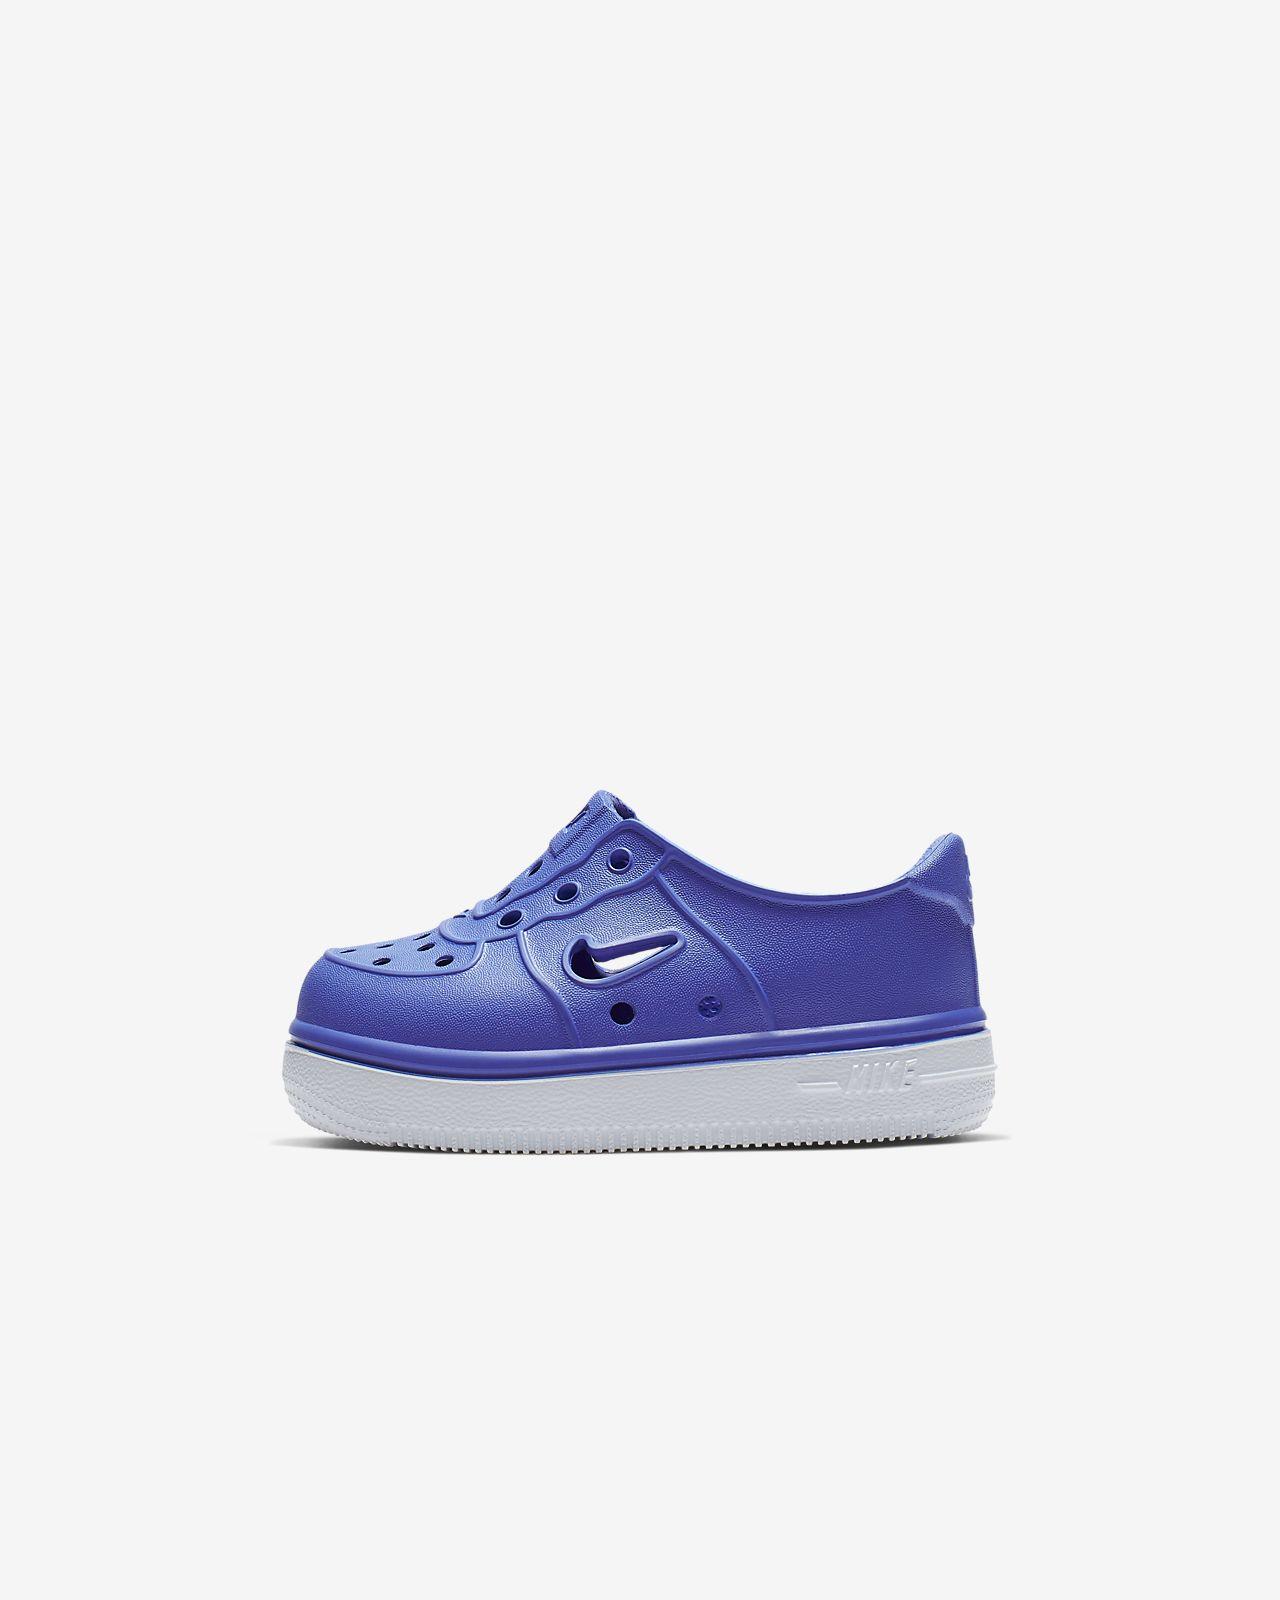 Nike Foam Force 1-sko til babyer/småbørn